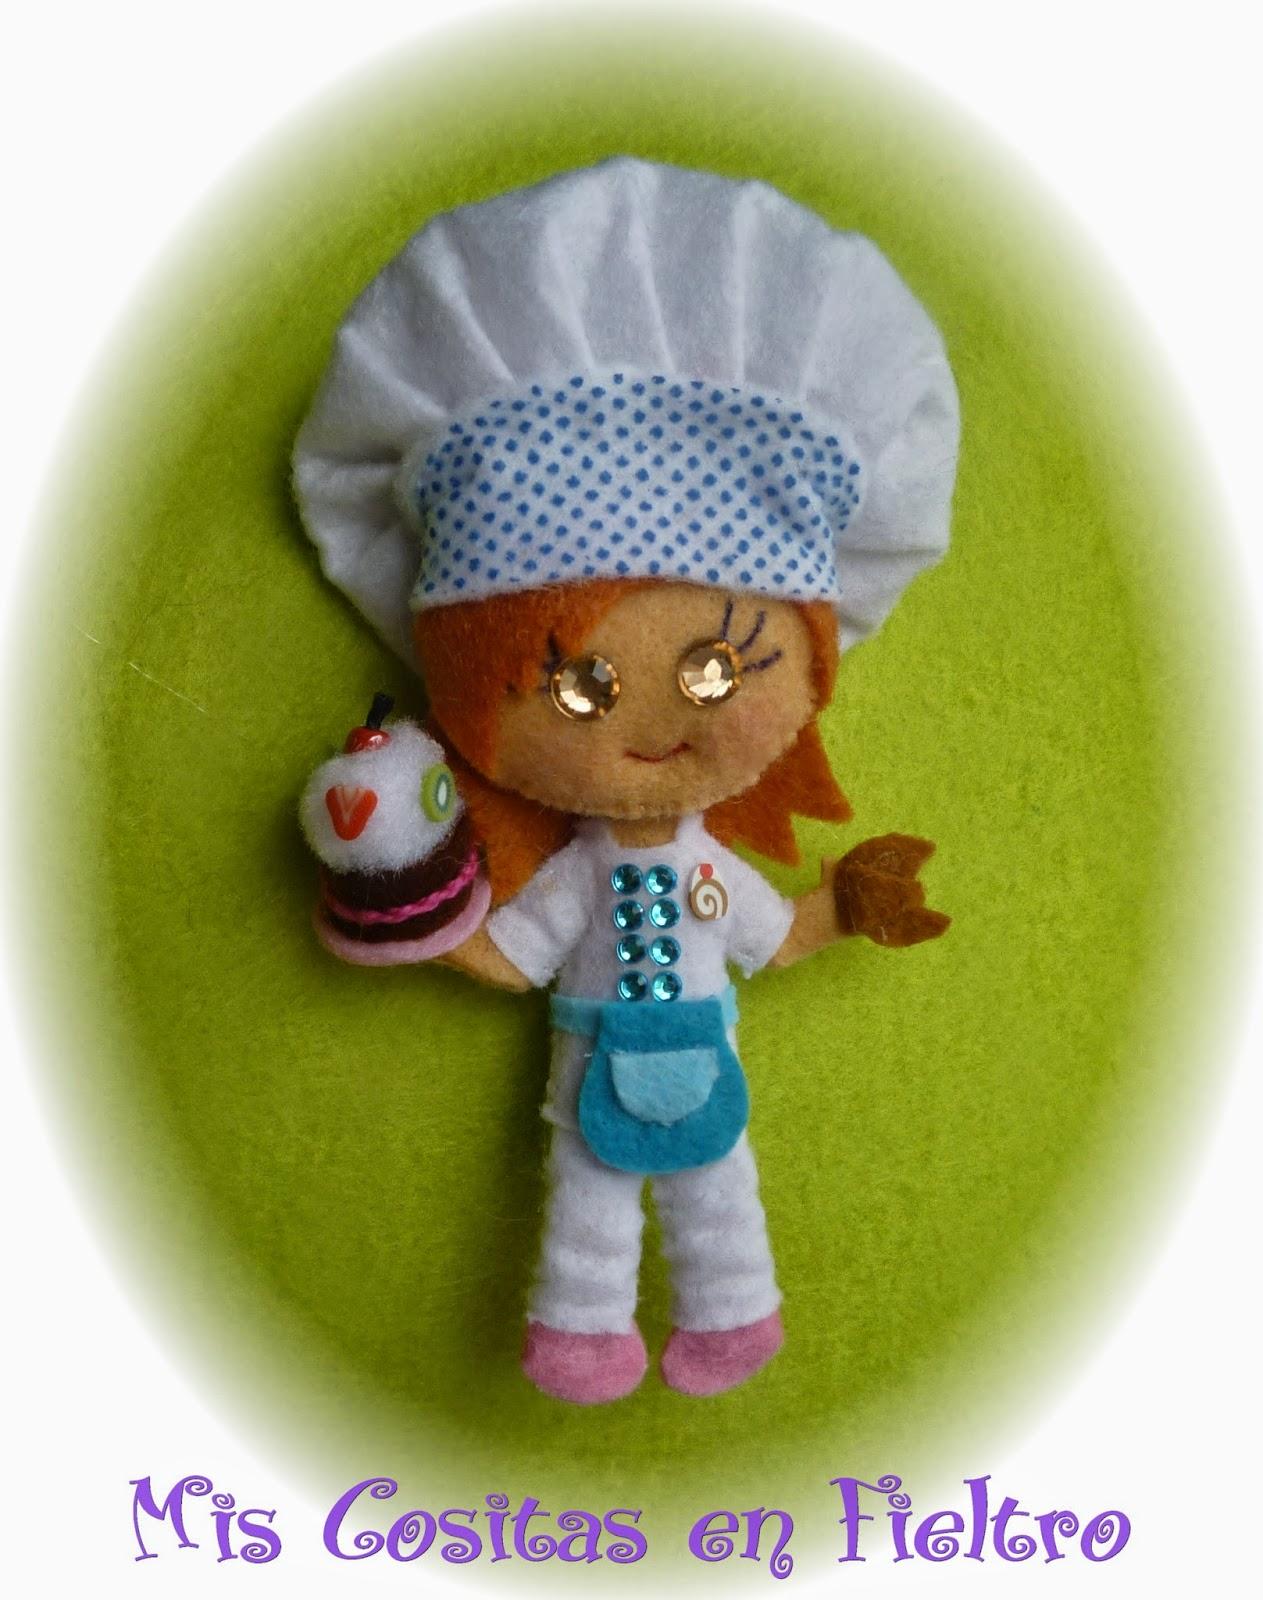 broche de fieltro, broche en fieltro, fieltro broche, broche, fieltro, felt, regalo, pin, Monigota, muñeca de fieltro, felt doll, cocinera, pastelera